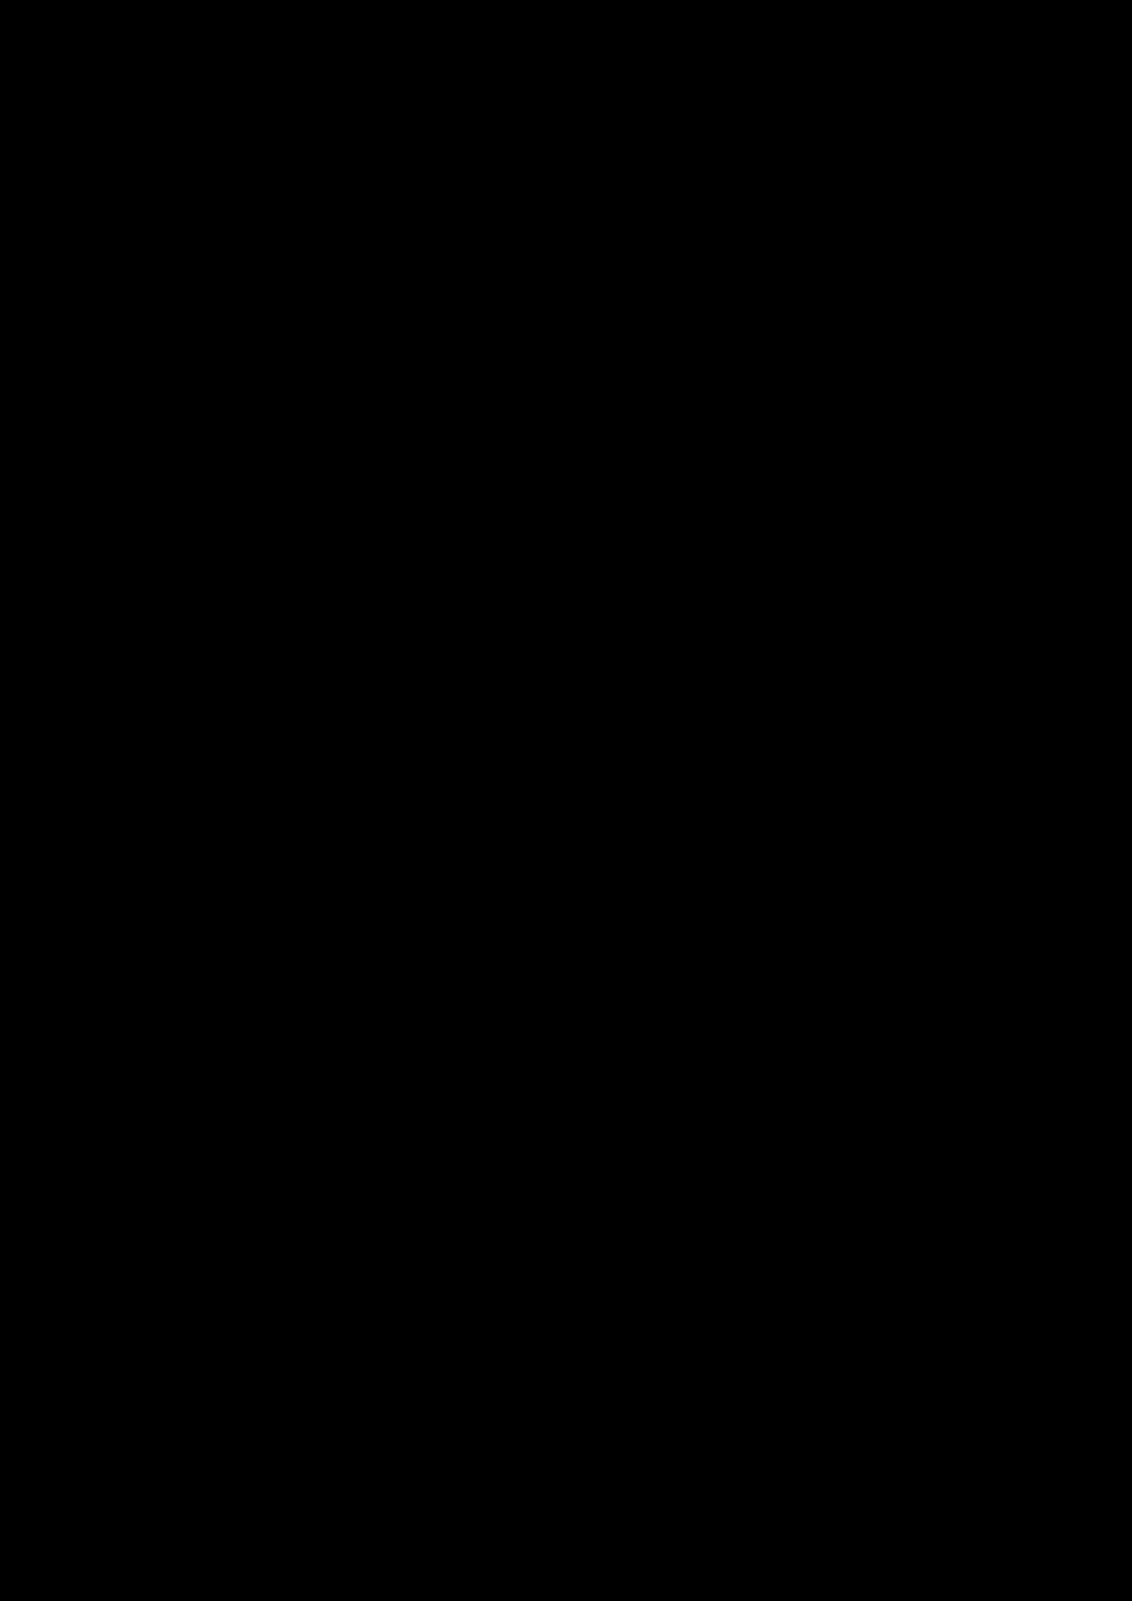 Ispoved Pervogo Boga slide, Image 51